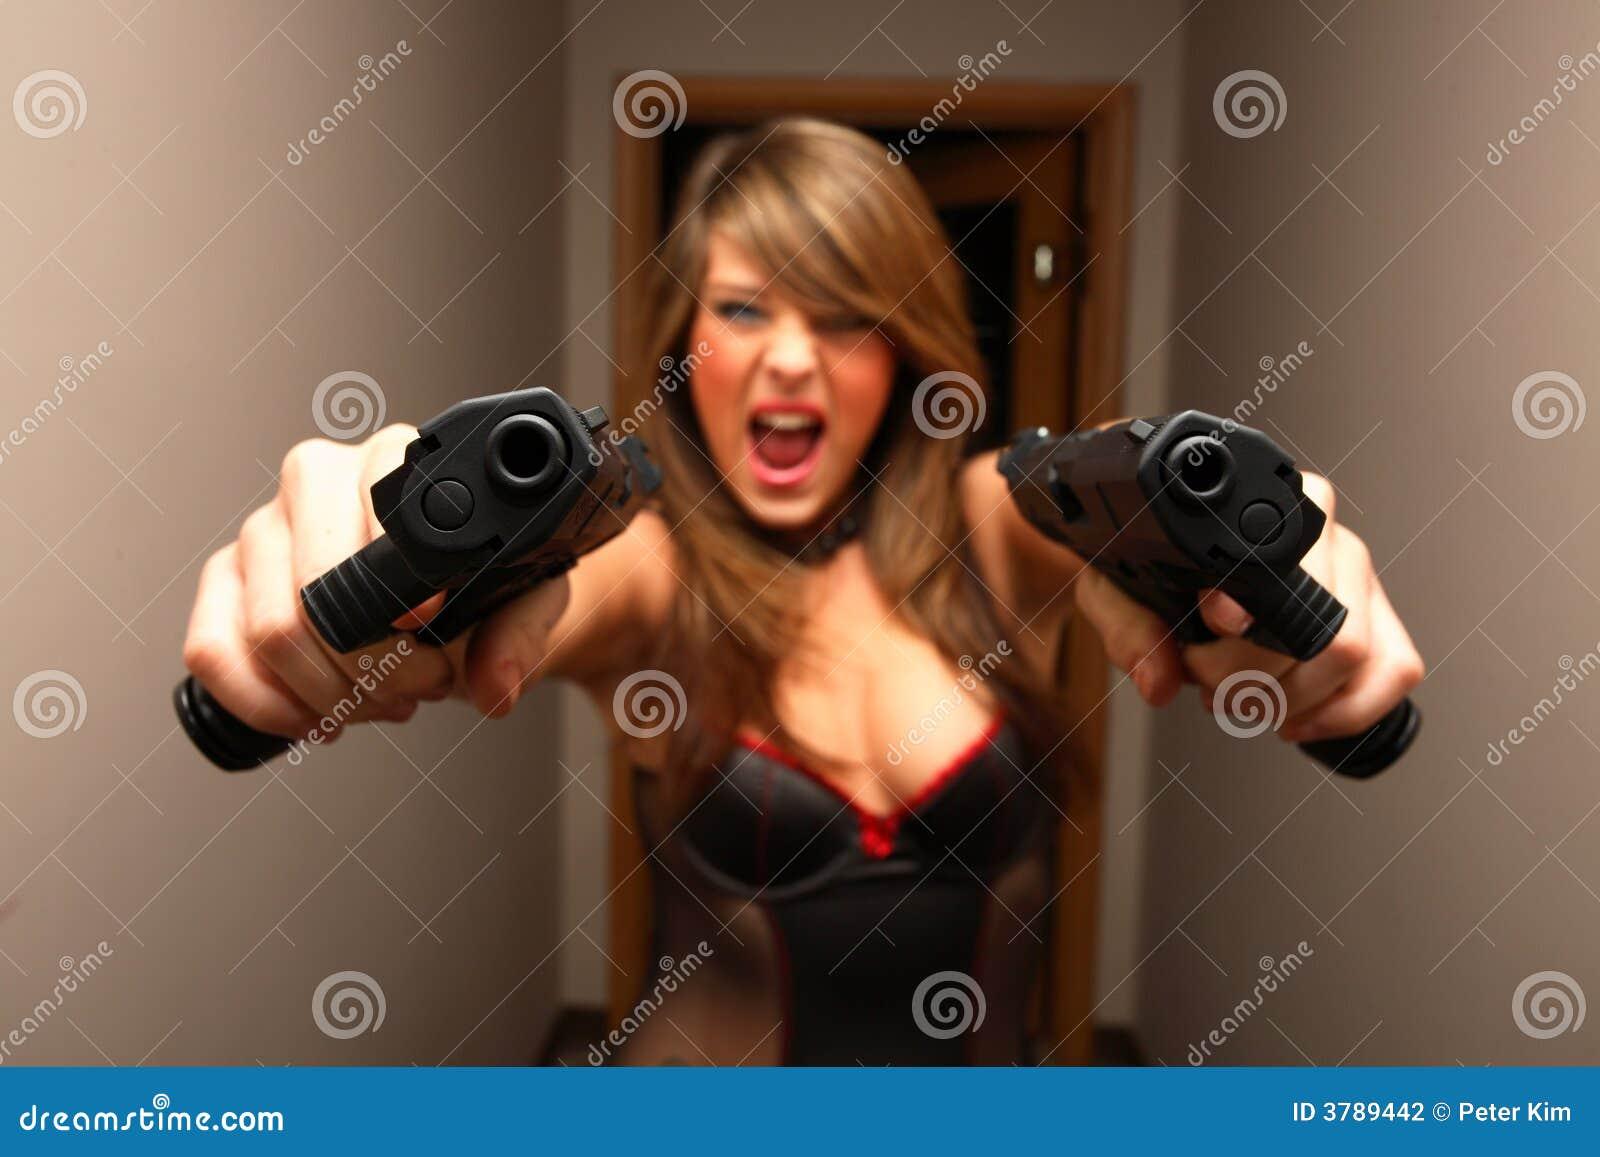 Point blank dual pistols